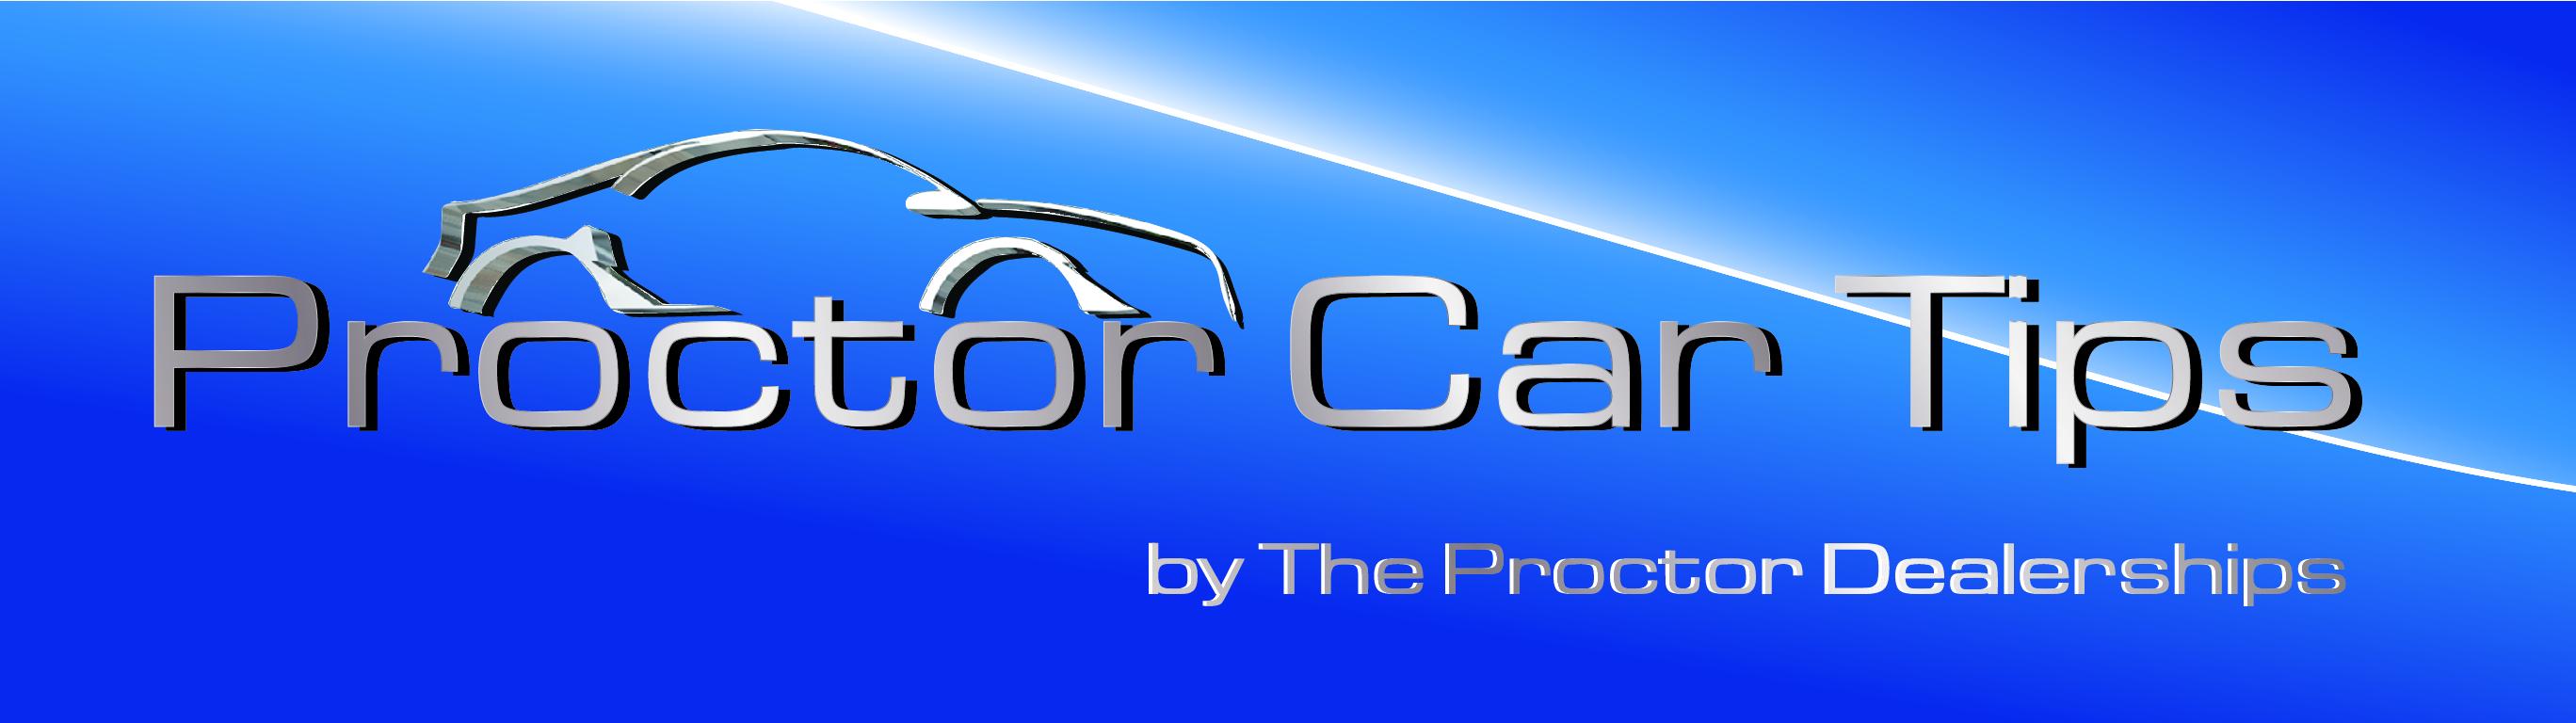 Proctor_car_tips